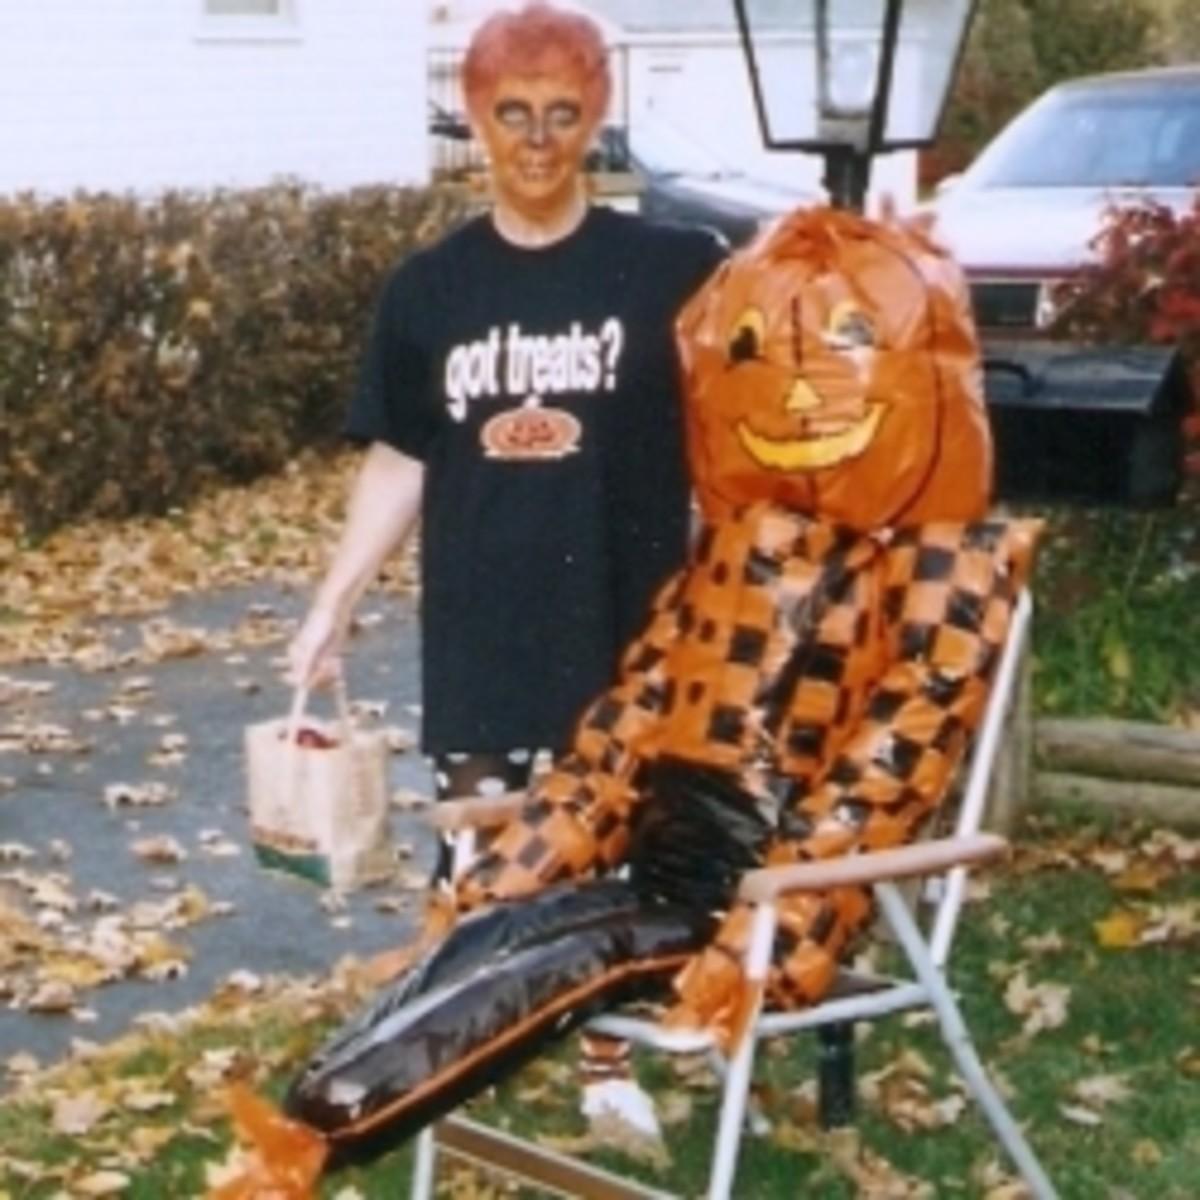 T-shirt, pajama pants, hair color make an easy, last-minute Halloween costume.